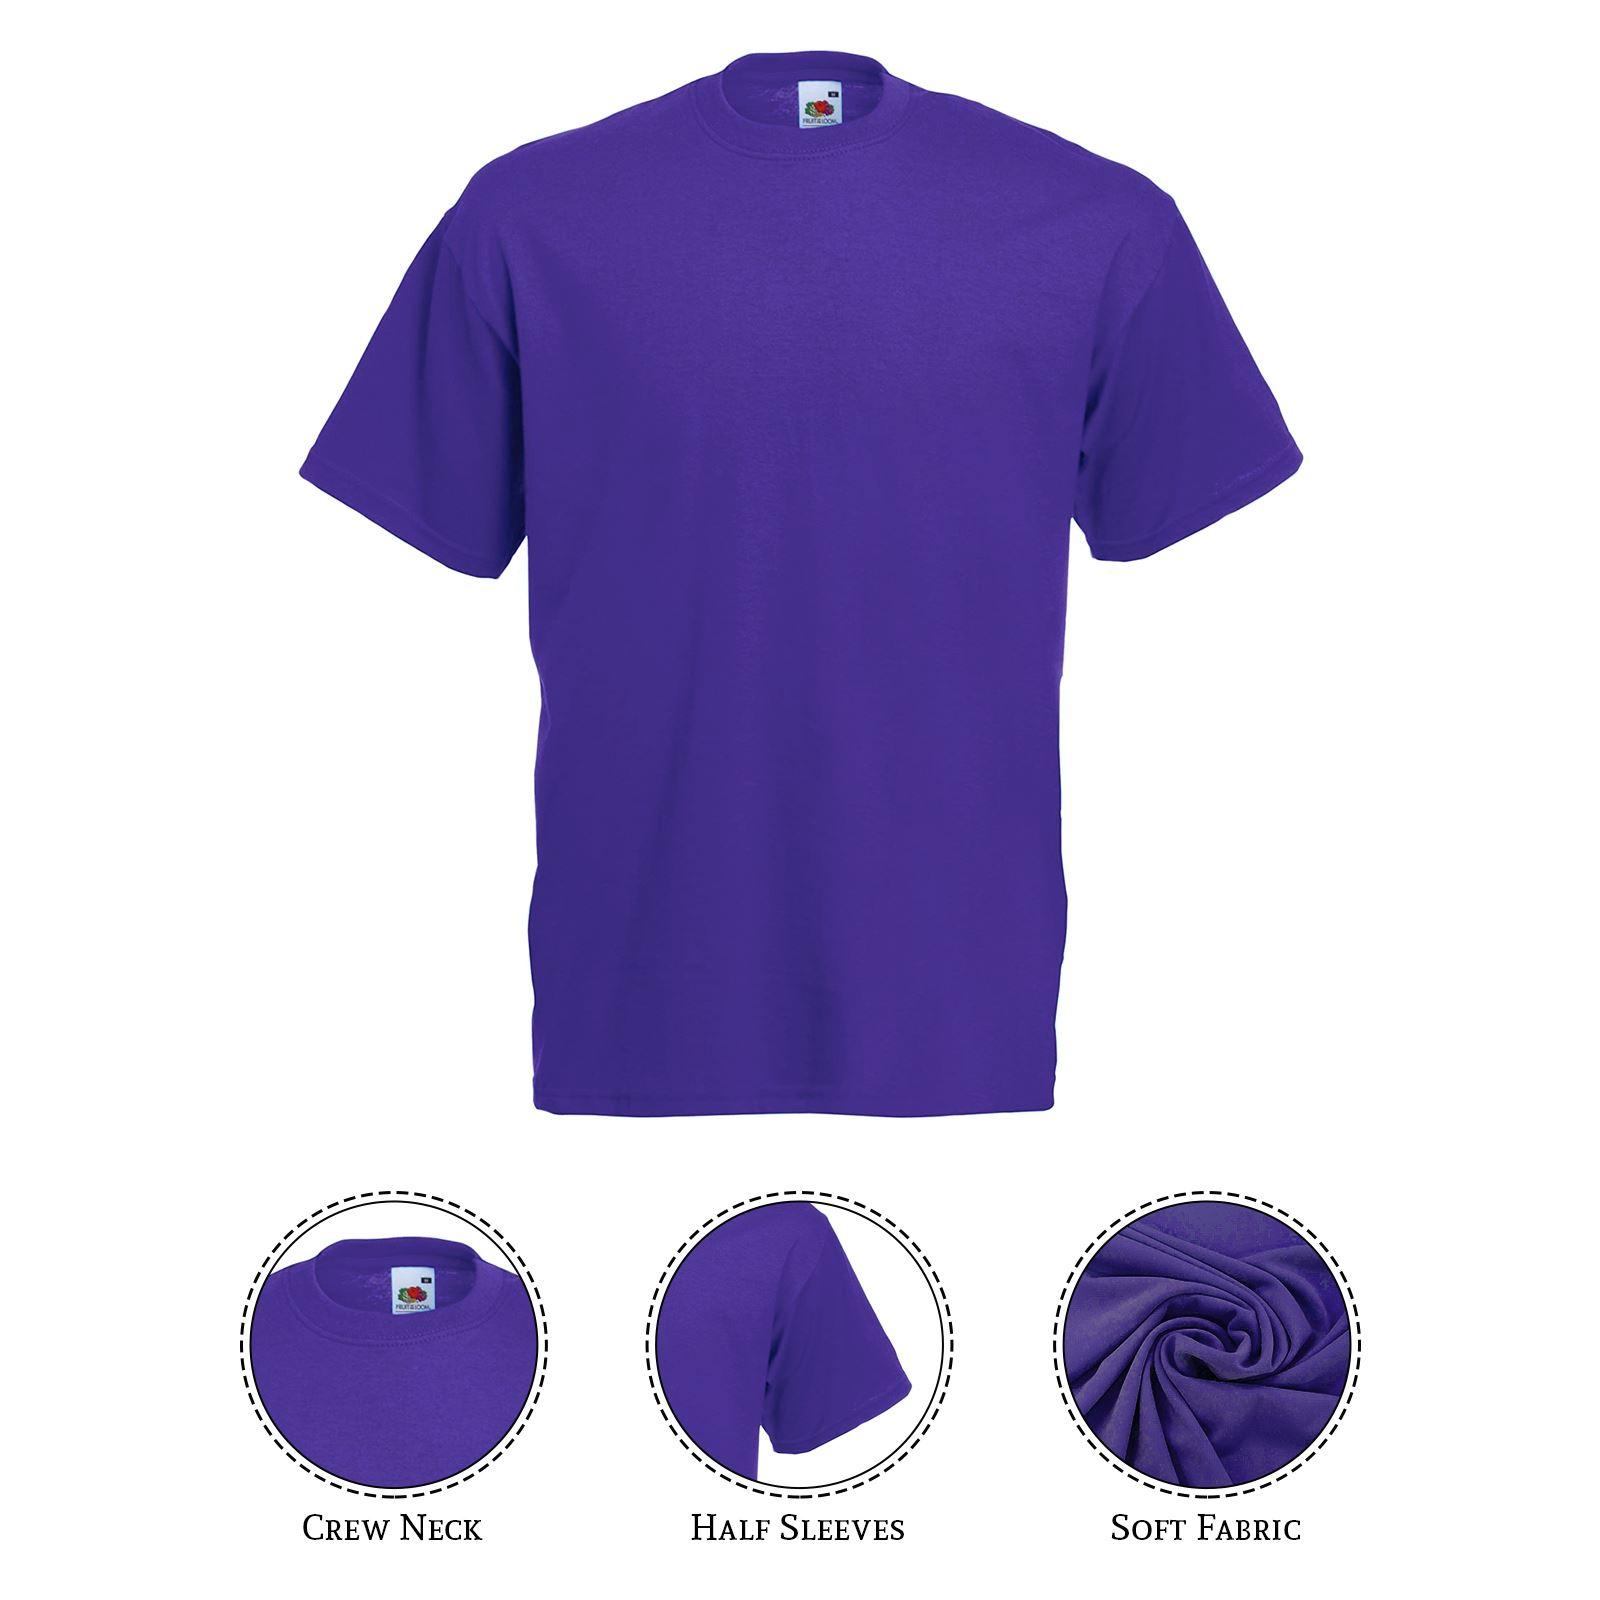 thumbnail 33 - Men-s-Fruit-Of-The-Loom-T-Shirt-Original-100-Cotton-Casual-Plain-Top-Tee